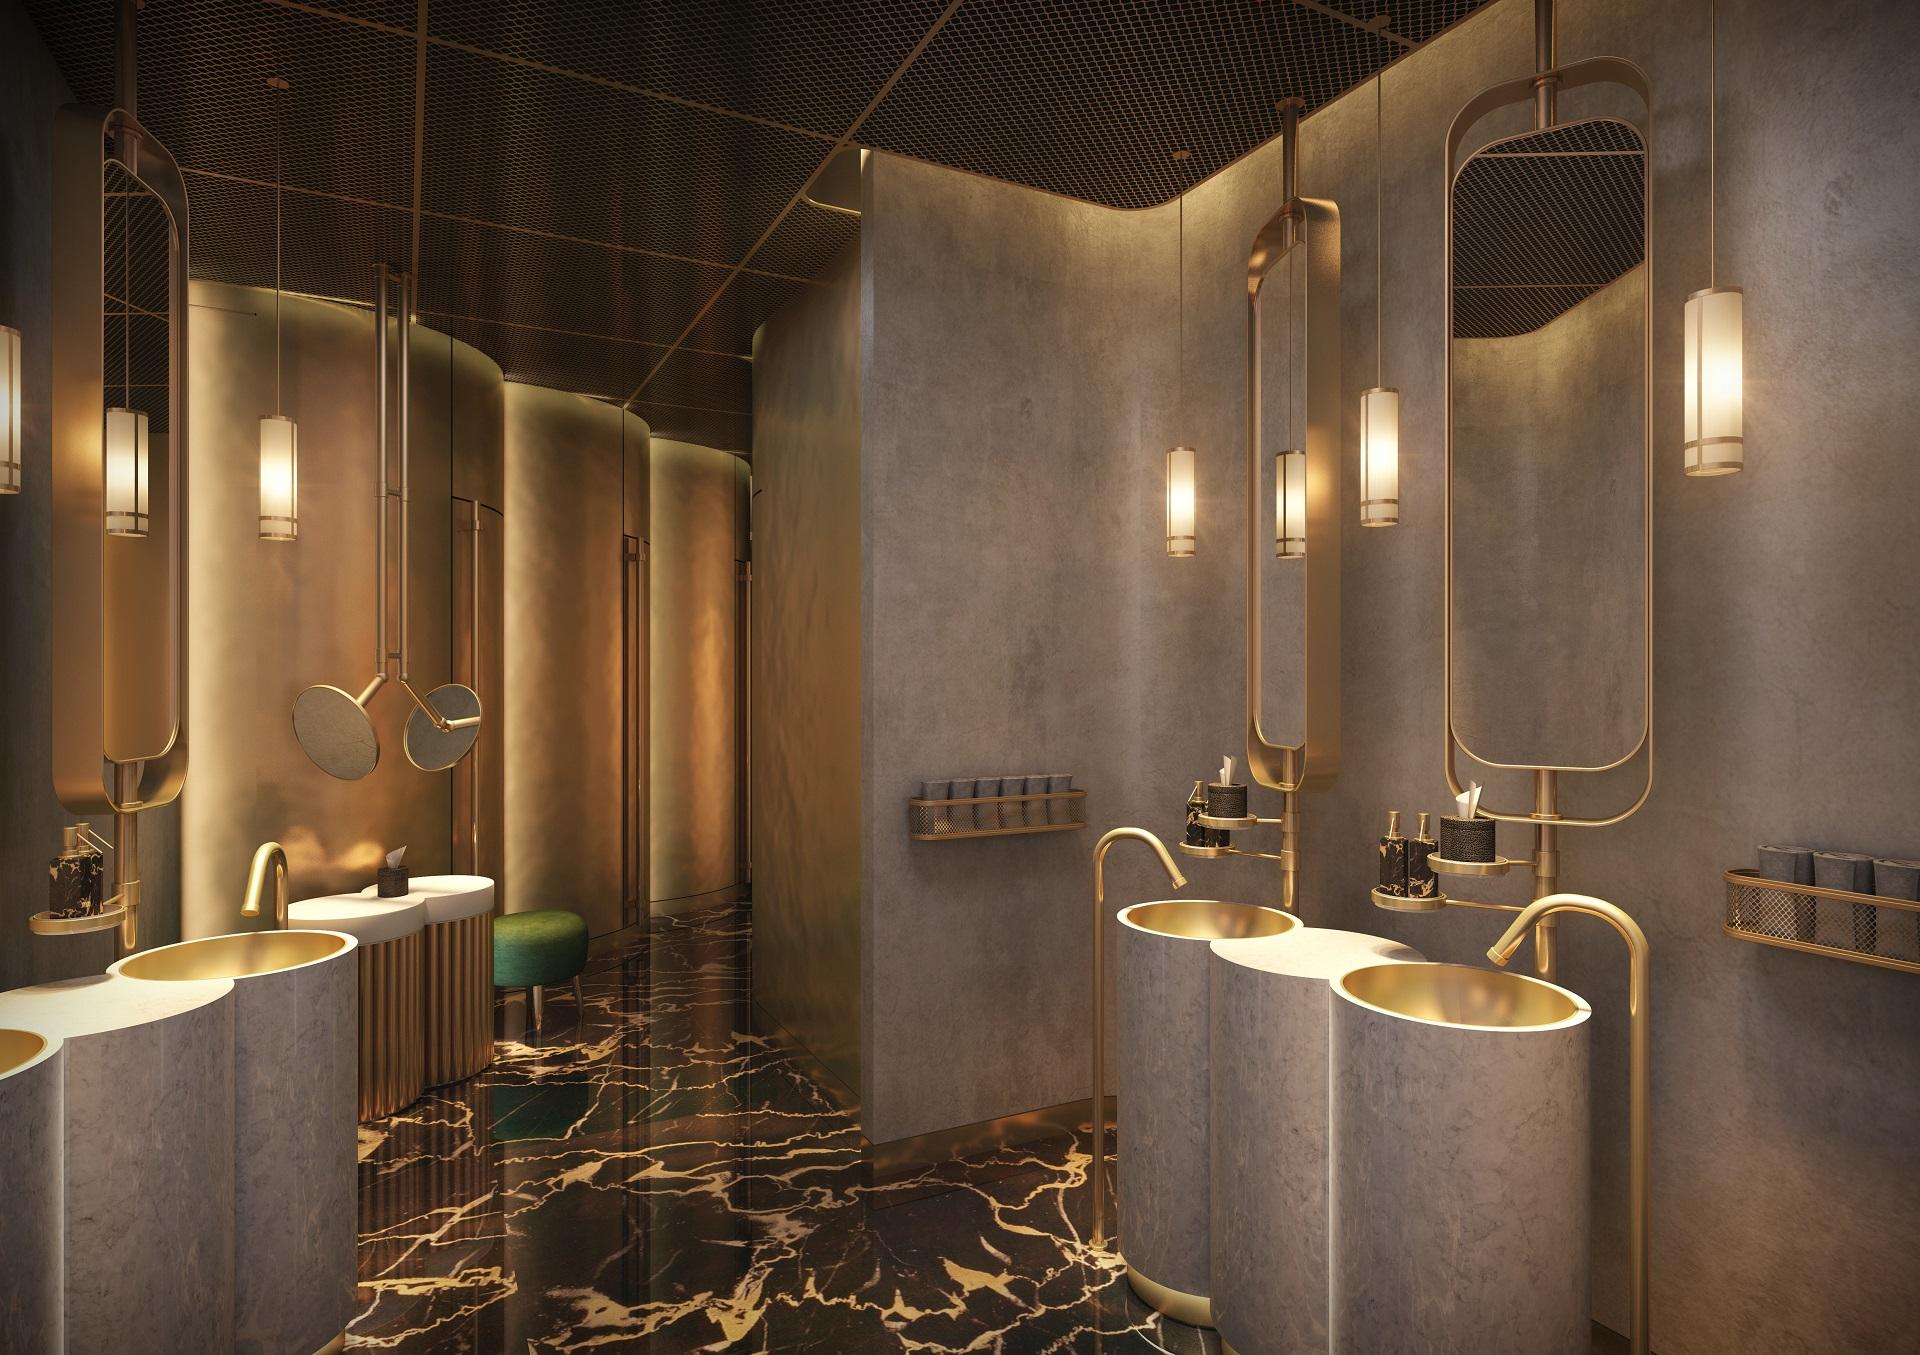 Mankhool Apartment - Rooftop Restaurant - Washroom 2